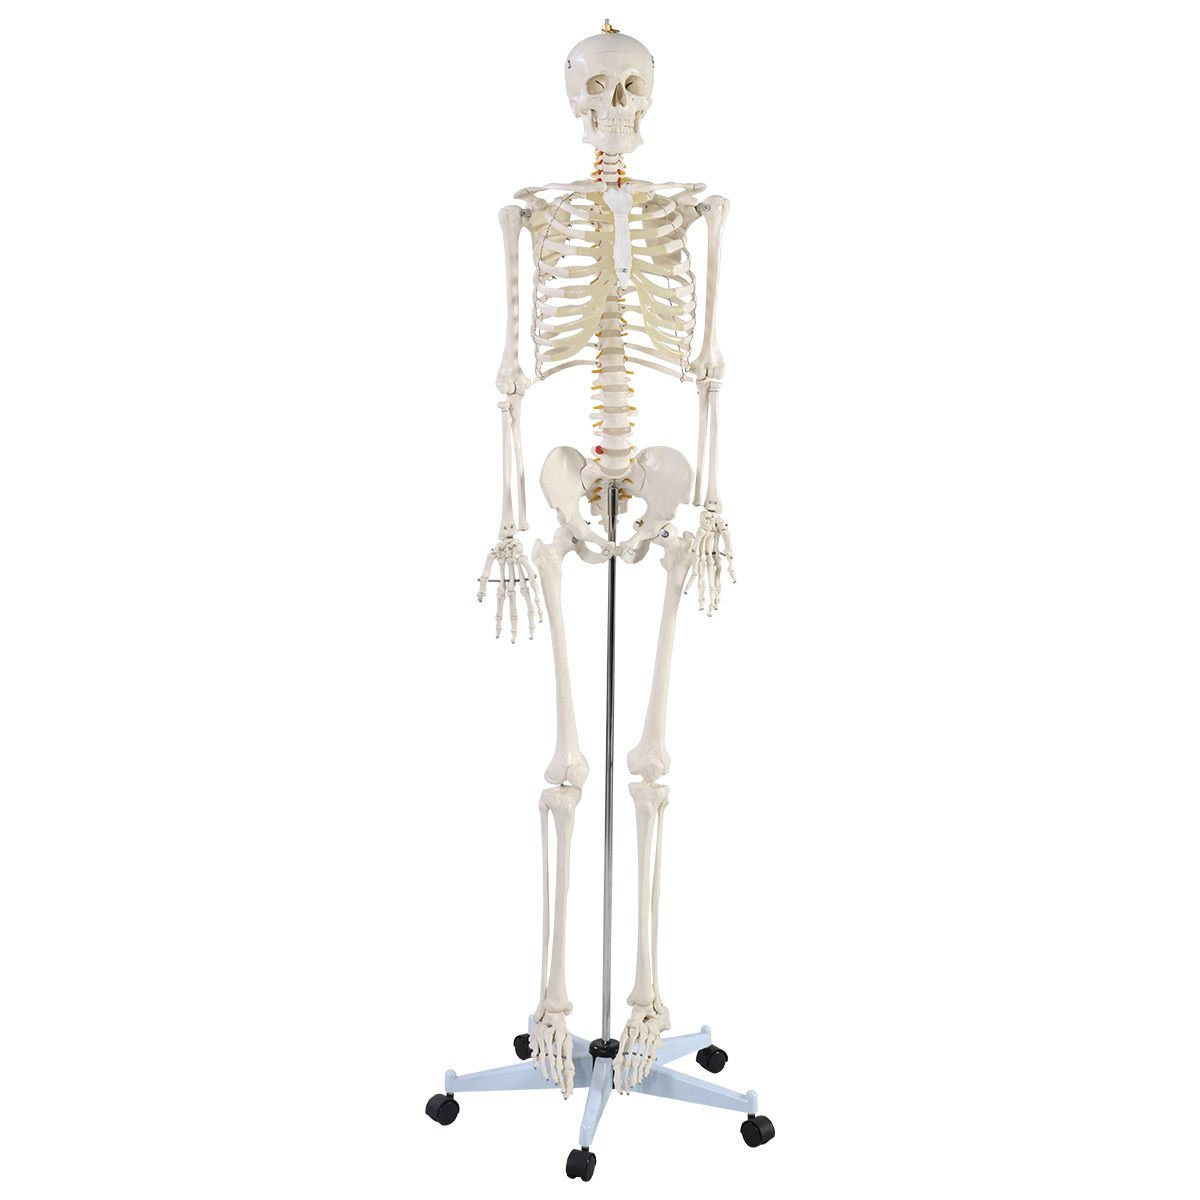 Giantex Life Size Human Anatomical Anatomy Skeleton Medical Model